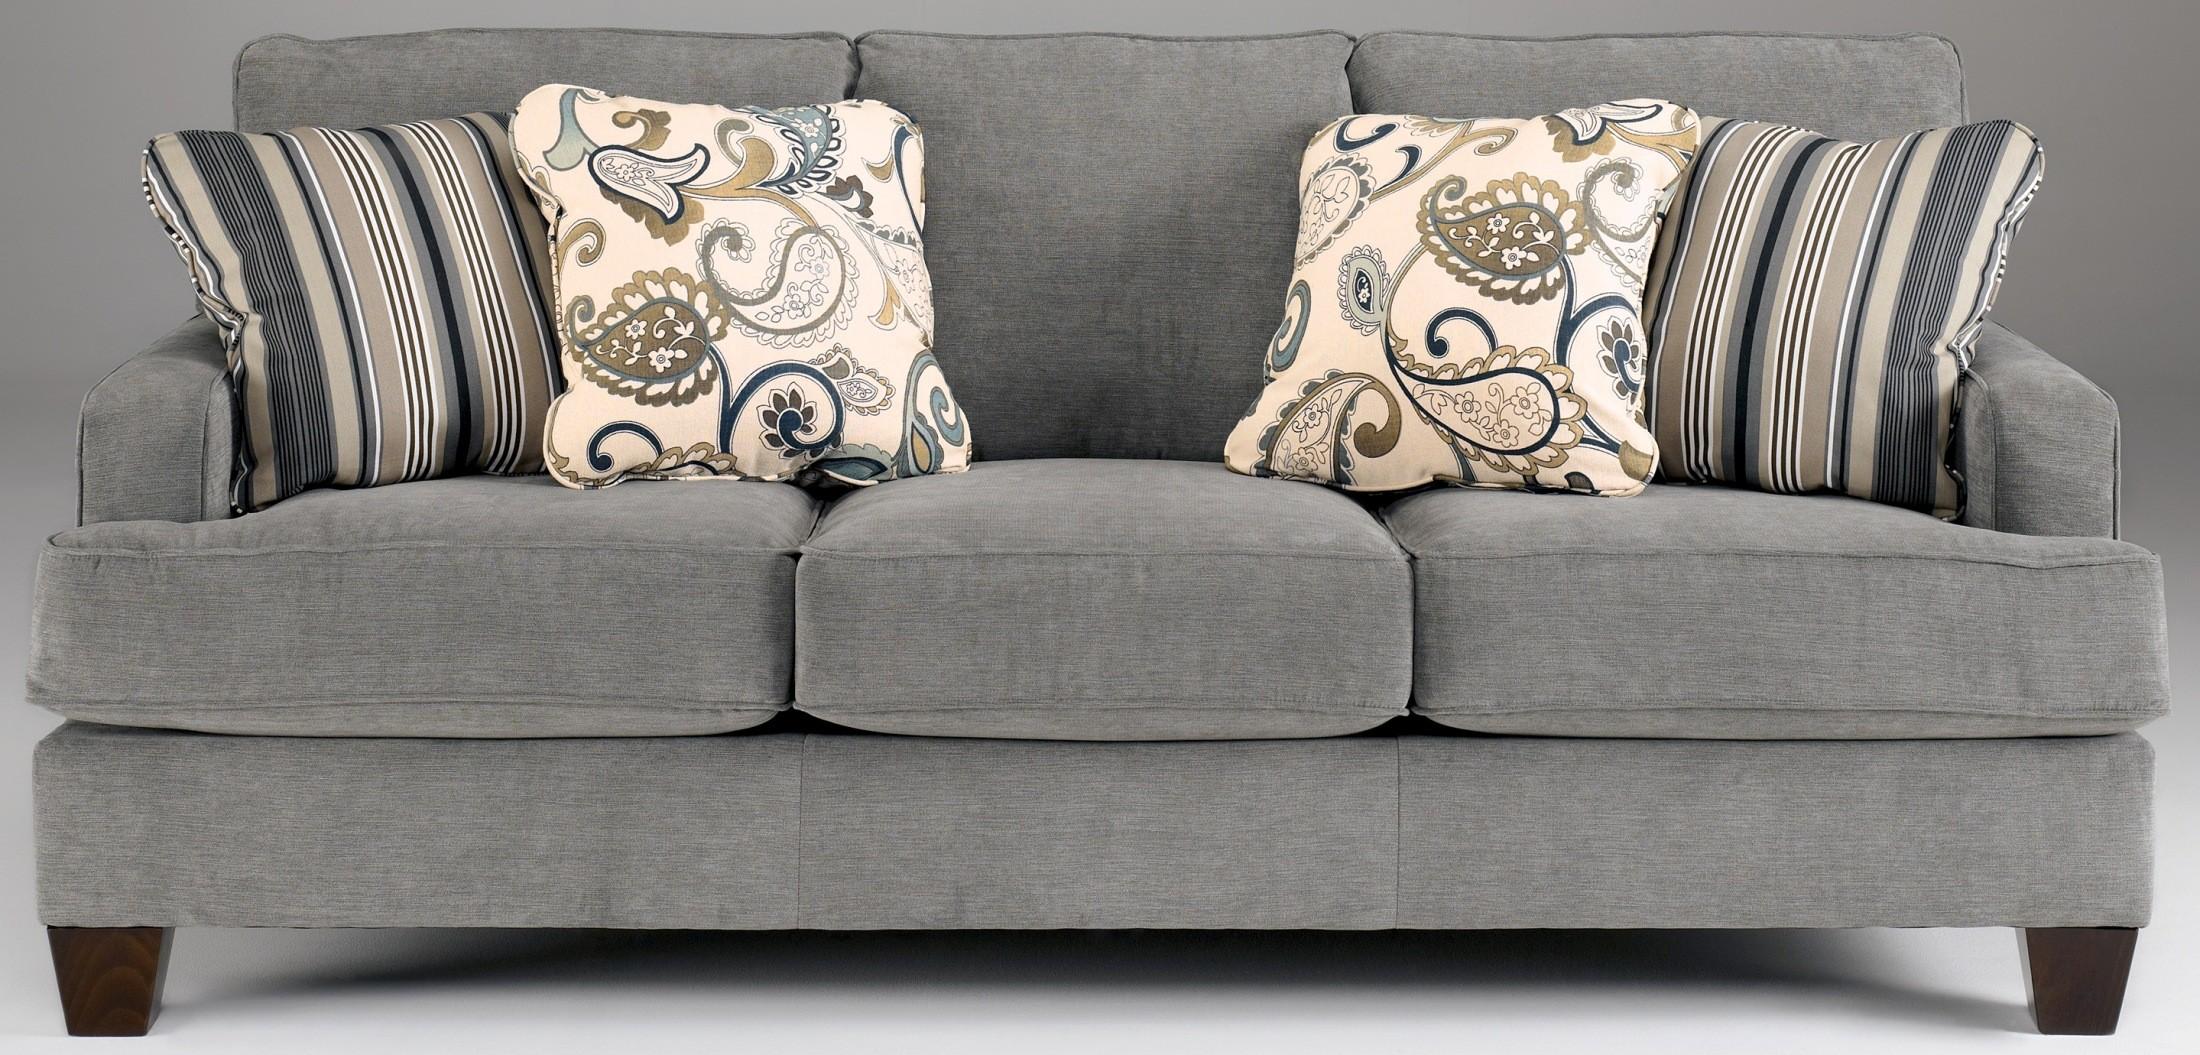 Yvette Steel Living Room Set From Ashley 77900 Coleman